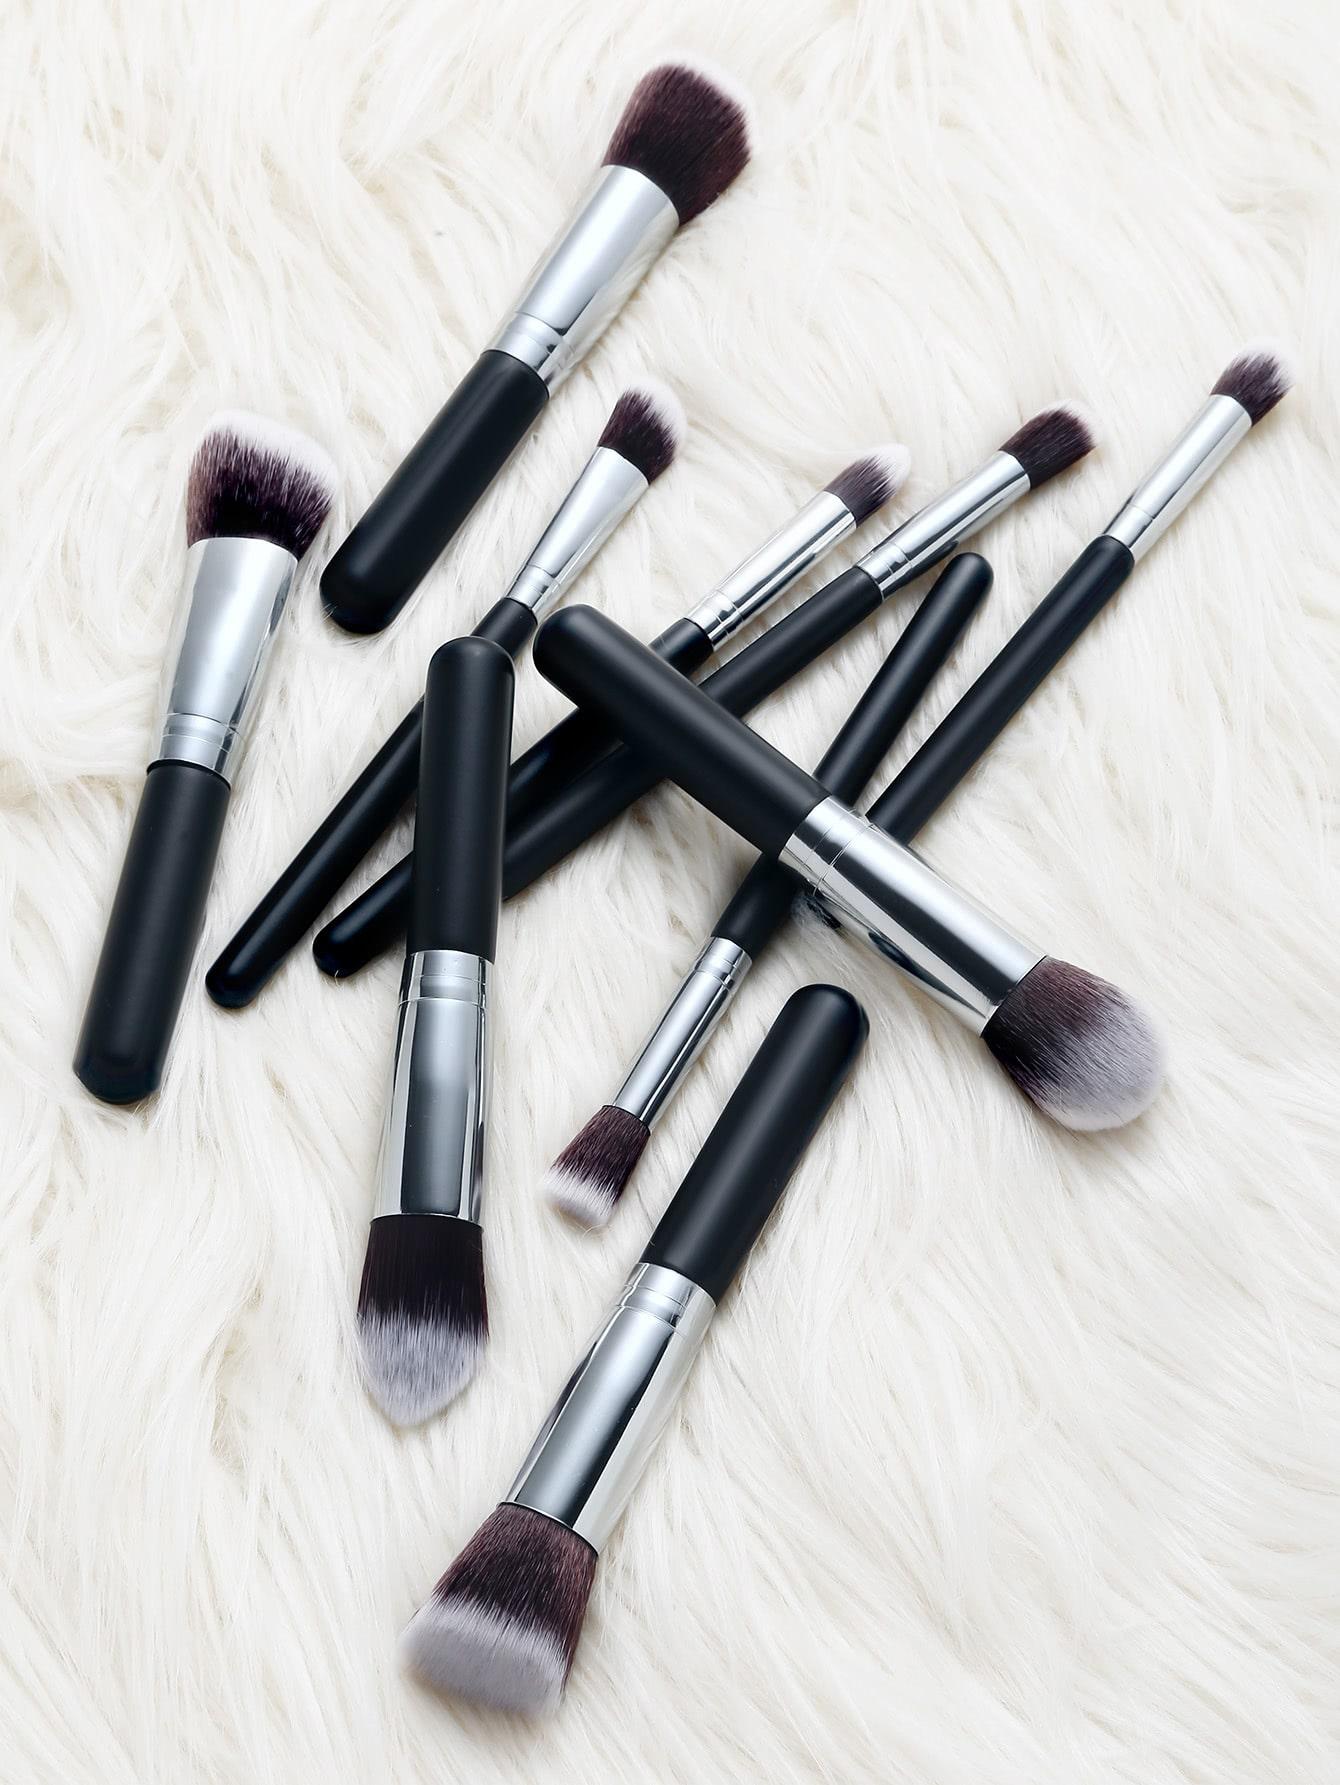 Фото Black And Sliver Professional Cosmetic Makeup Brush Set 10PCS. Купить с доставкой